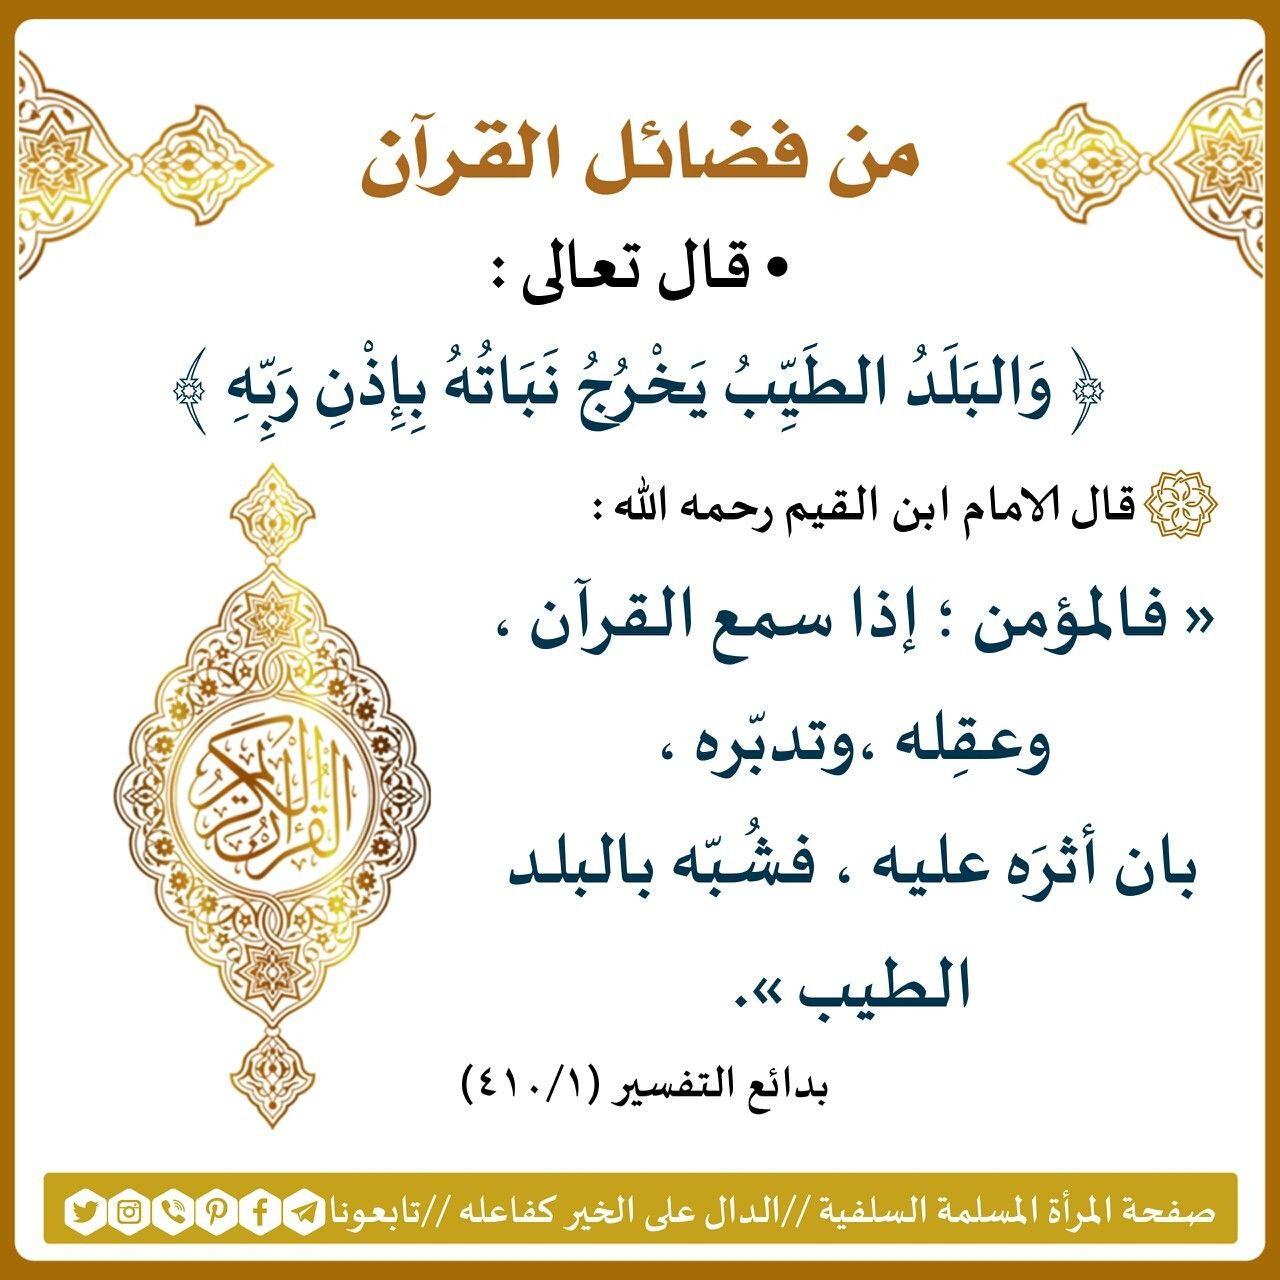 Pin By زهرة الياسمين On اقرأ كتاب الل ه Arabic Calligraphy Calligraphy